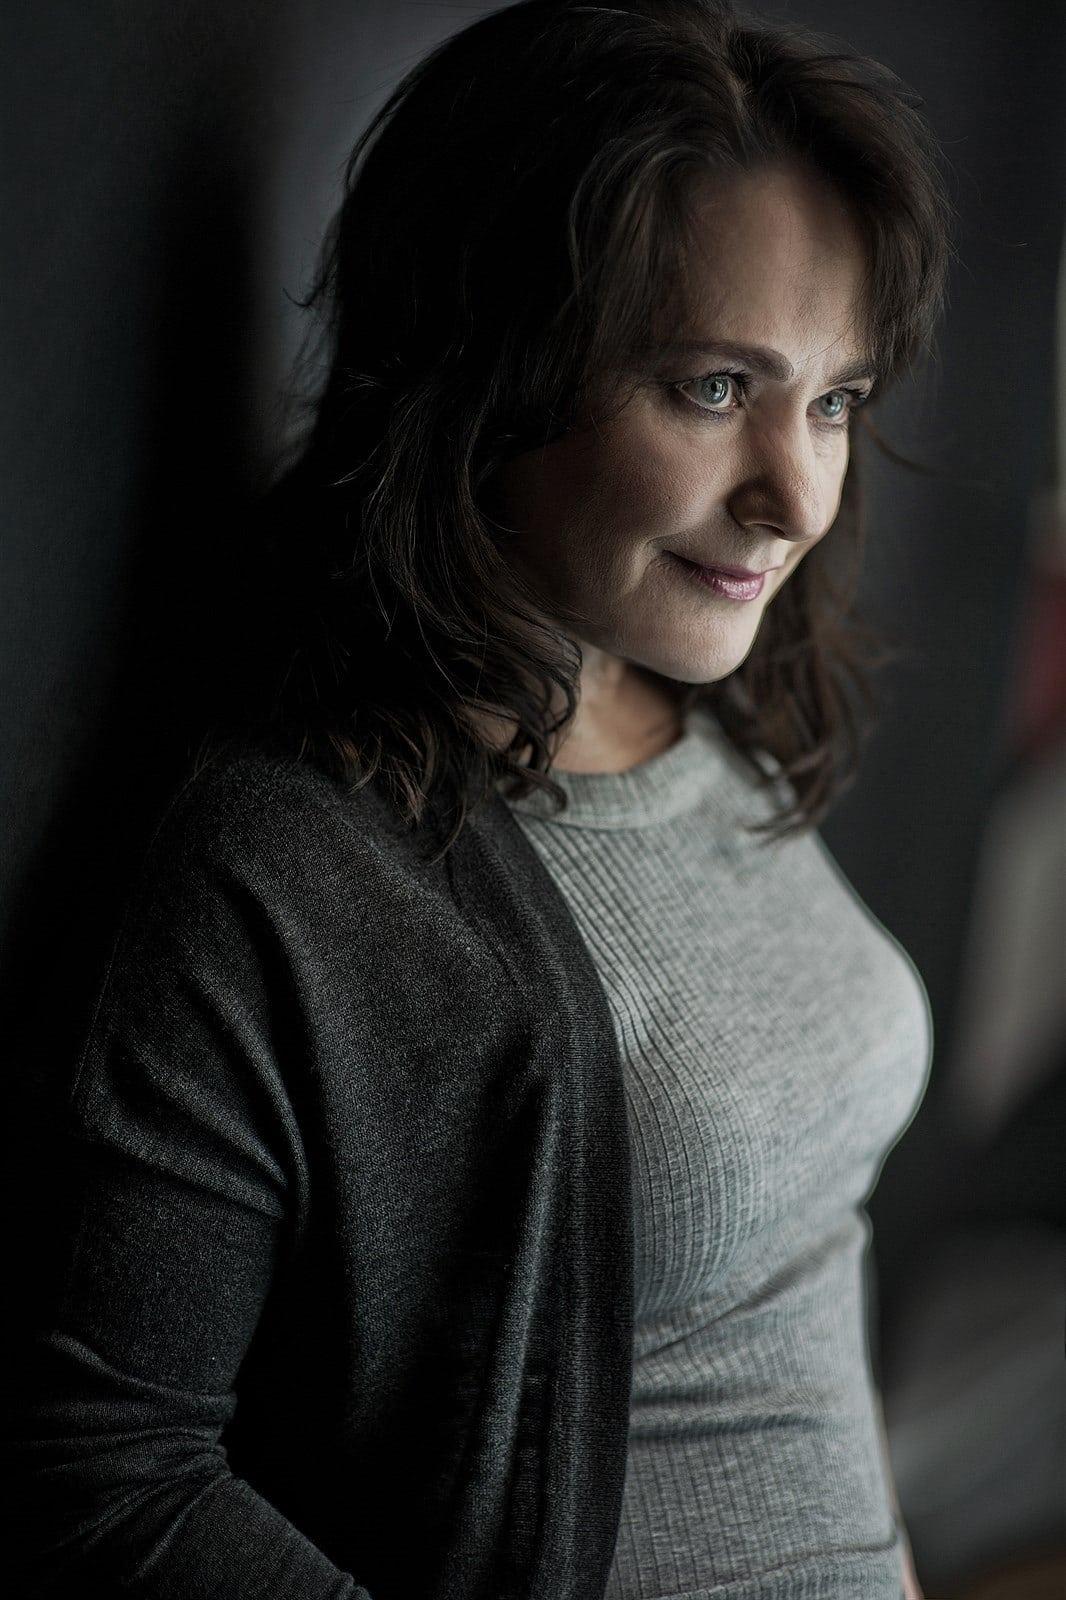 images Miriam Chytilova